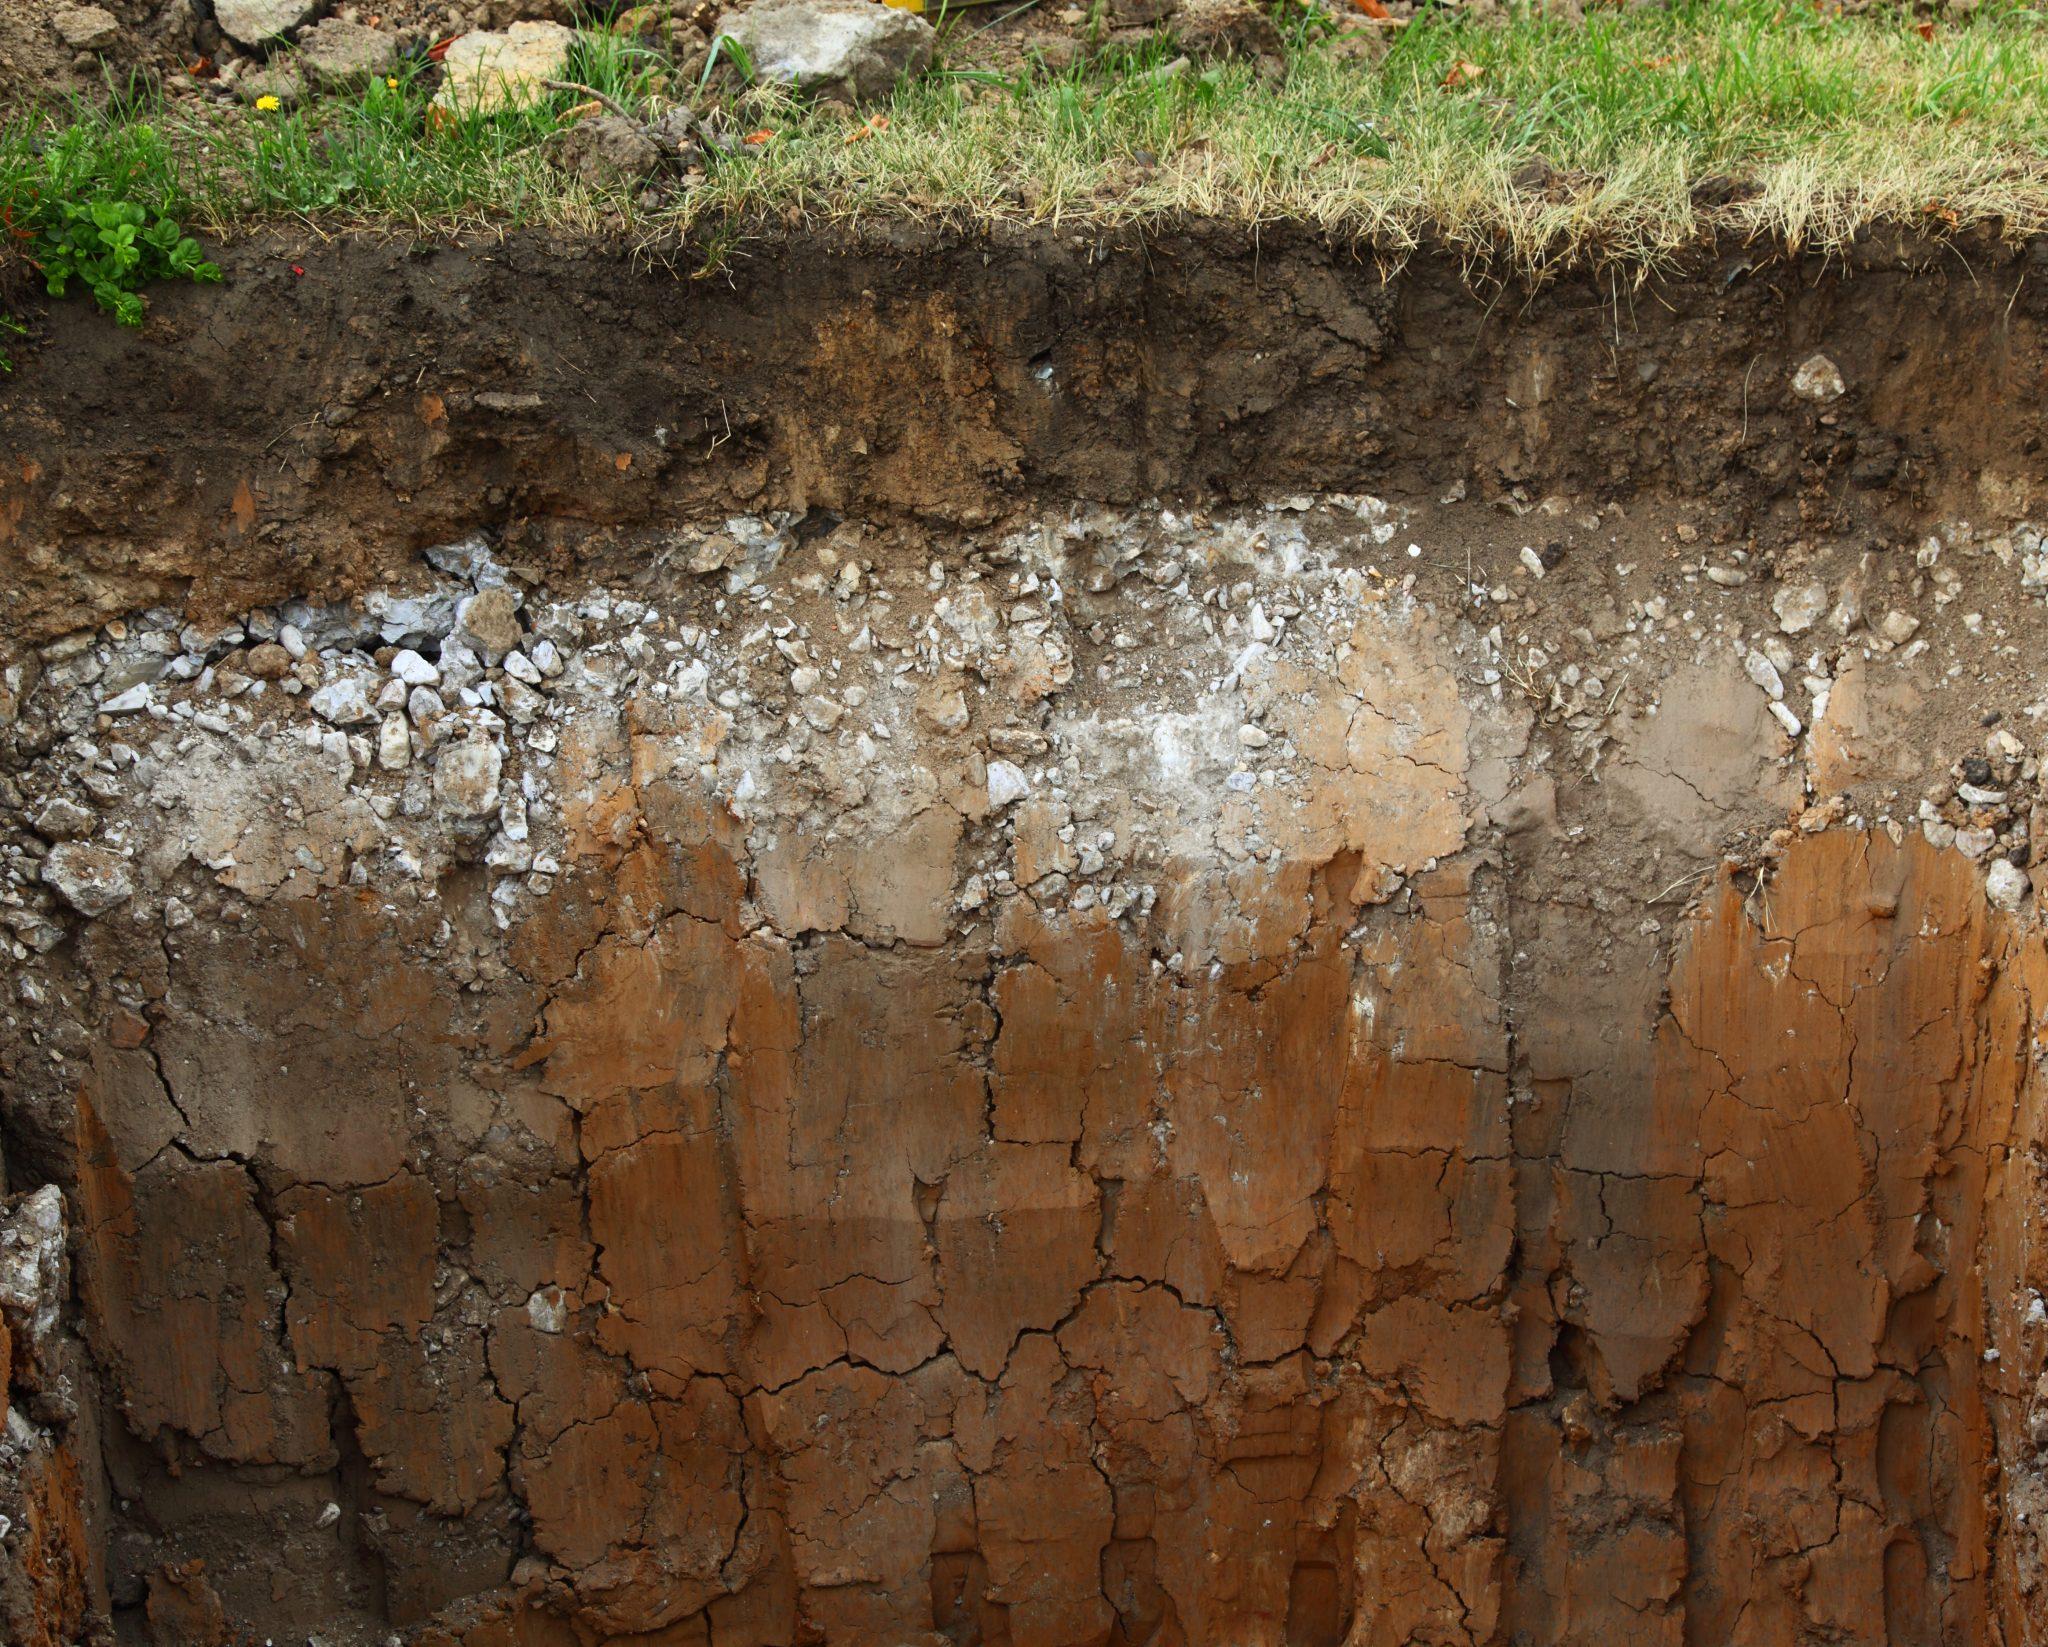 underground soil layers. shutterstock.com/Antonov Roman